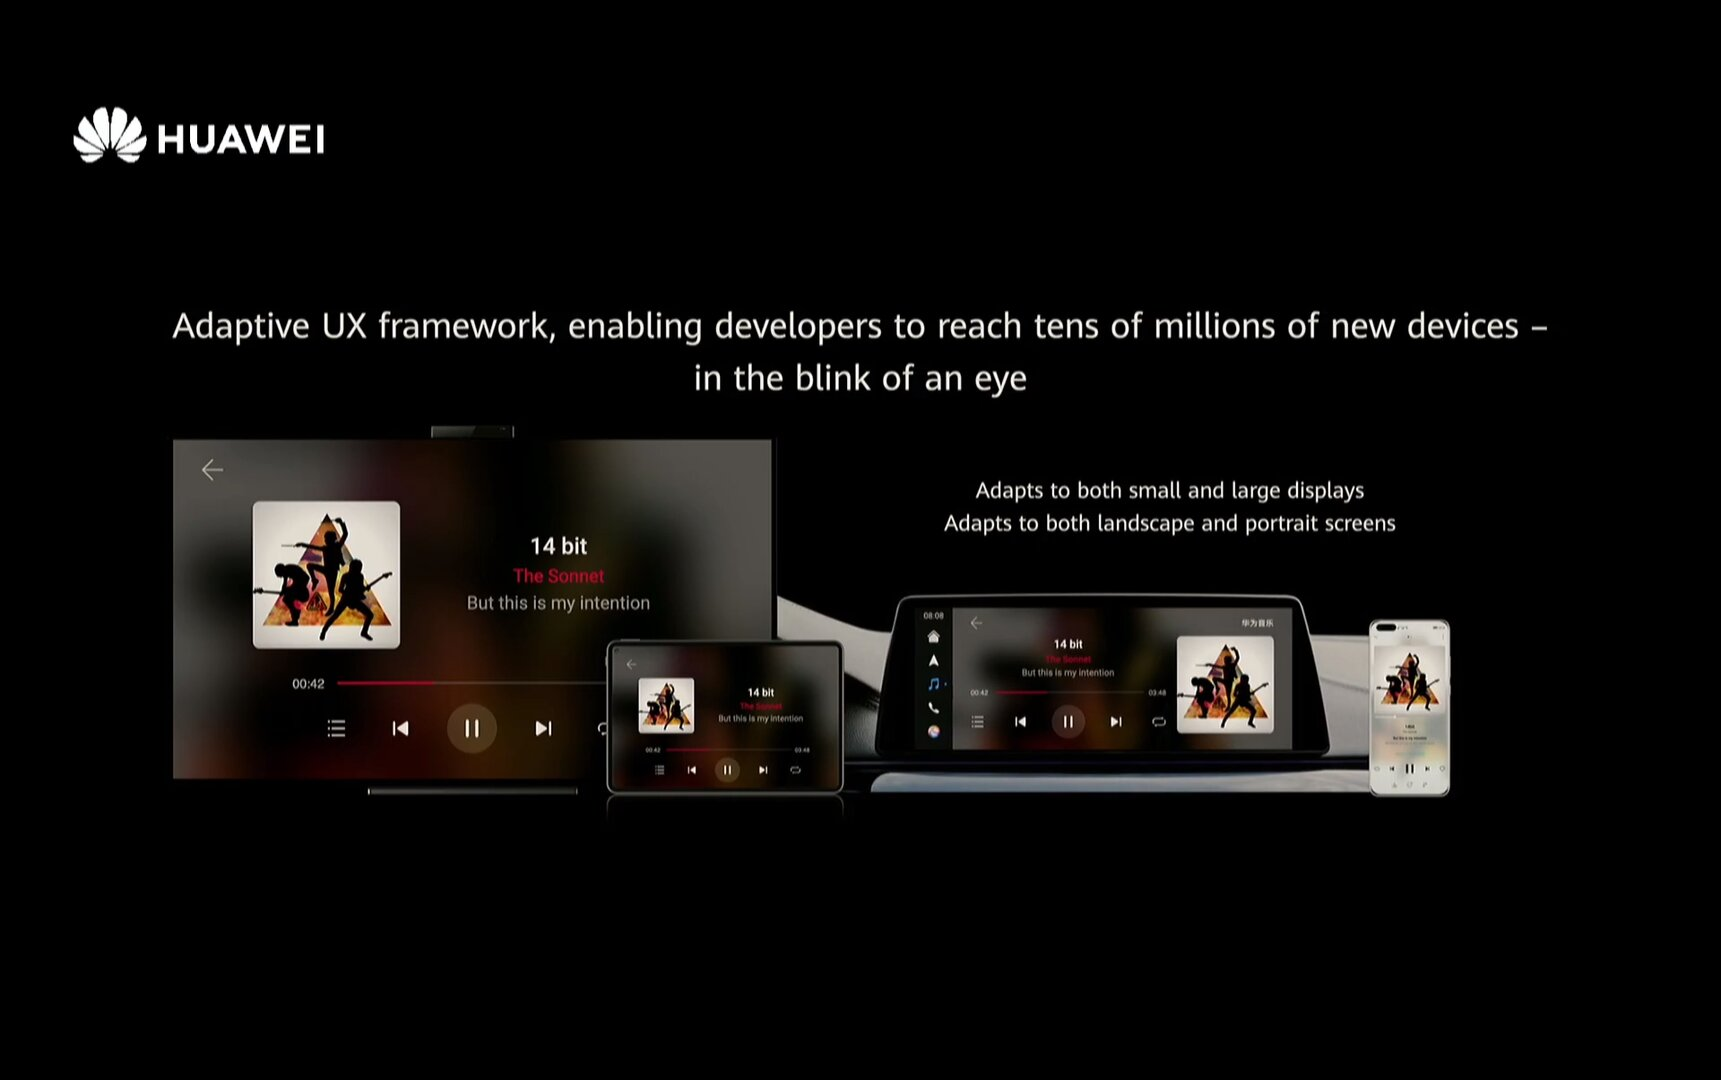 HarmonyOS 2.0 hat ein adaptives UI für alle Geräteklassen